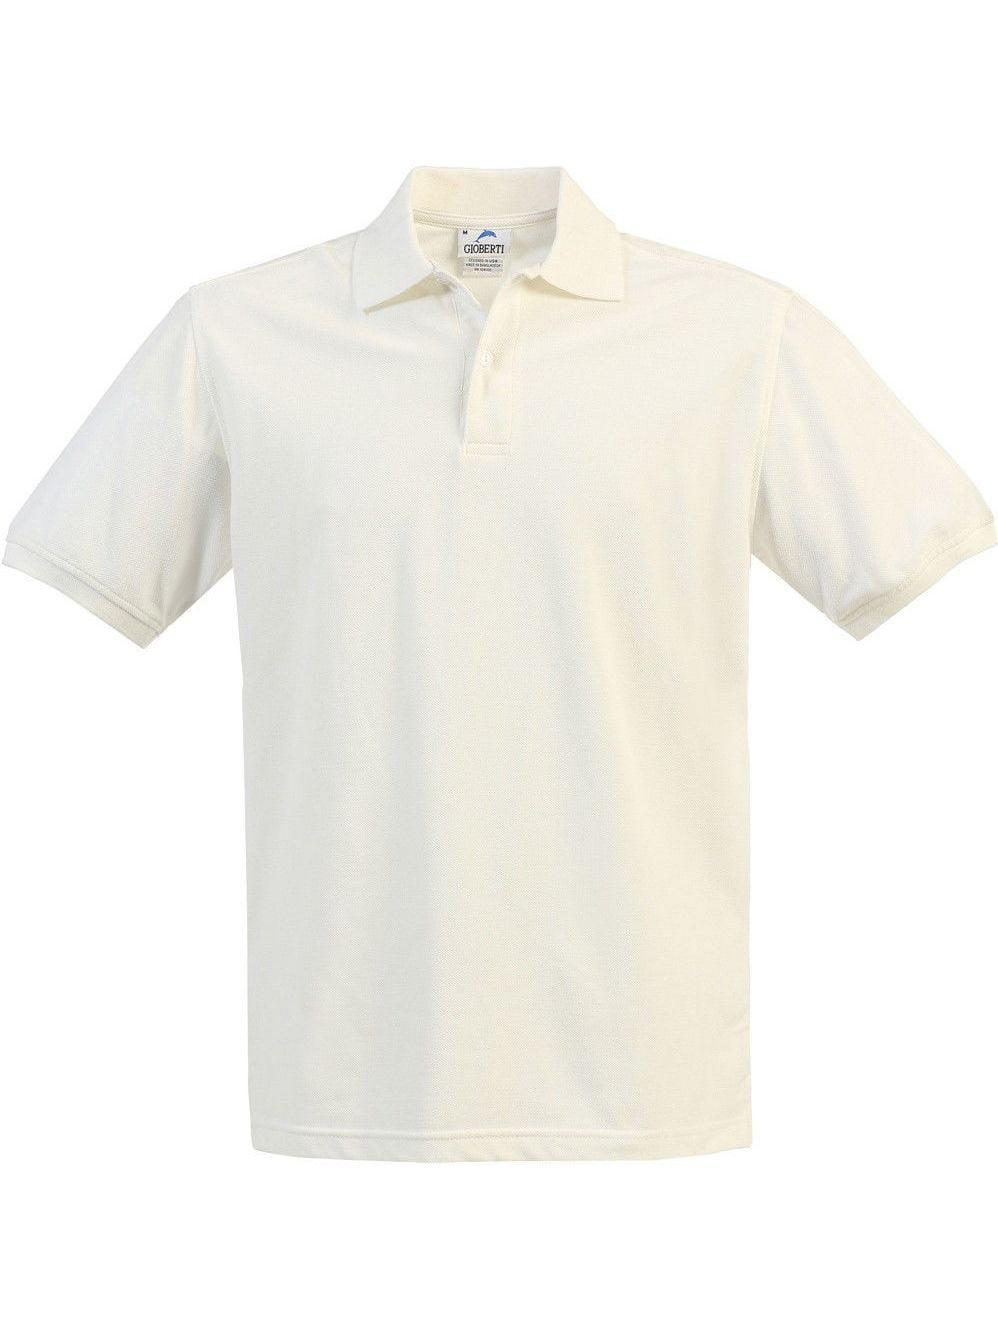 Boys Girls Ivory Short Sleeve School Uniform Polo Shirt 8-16